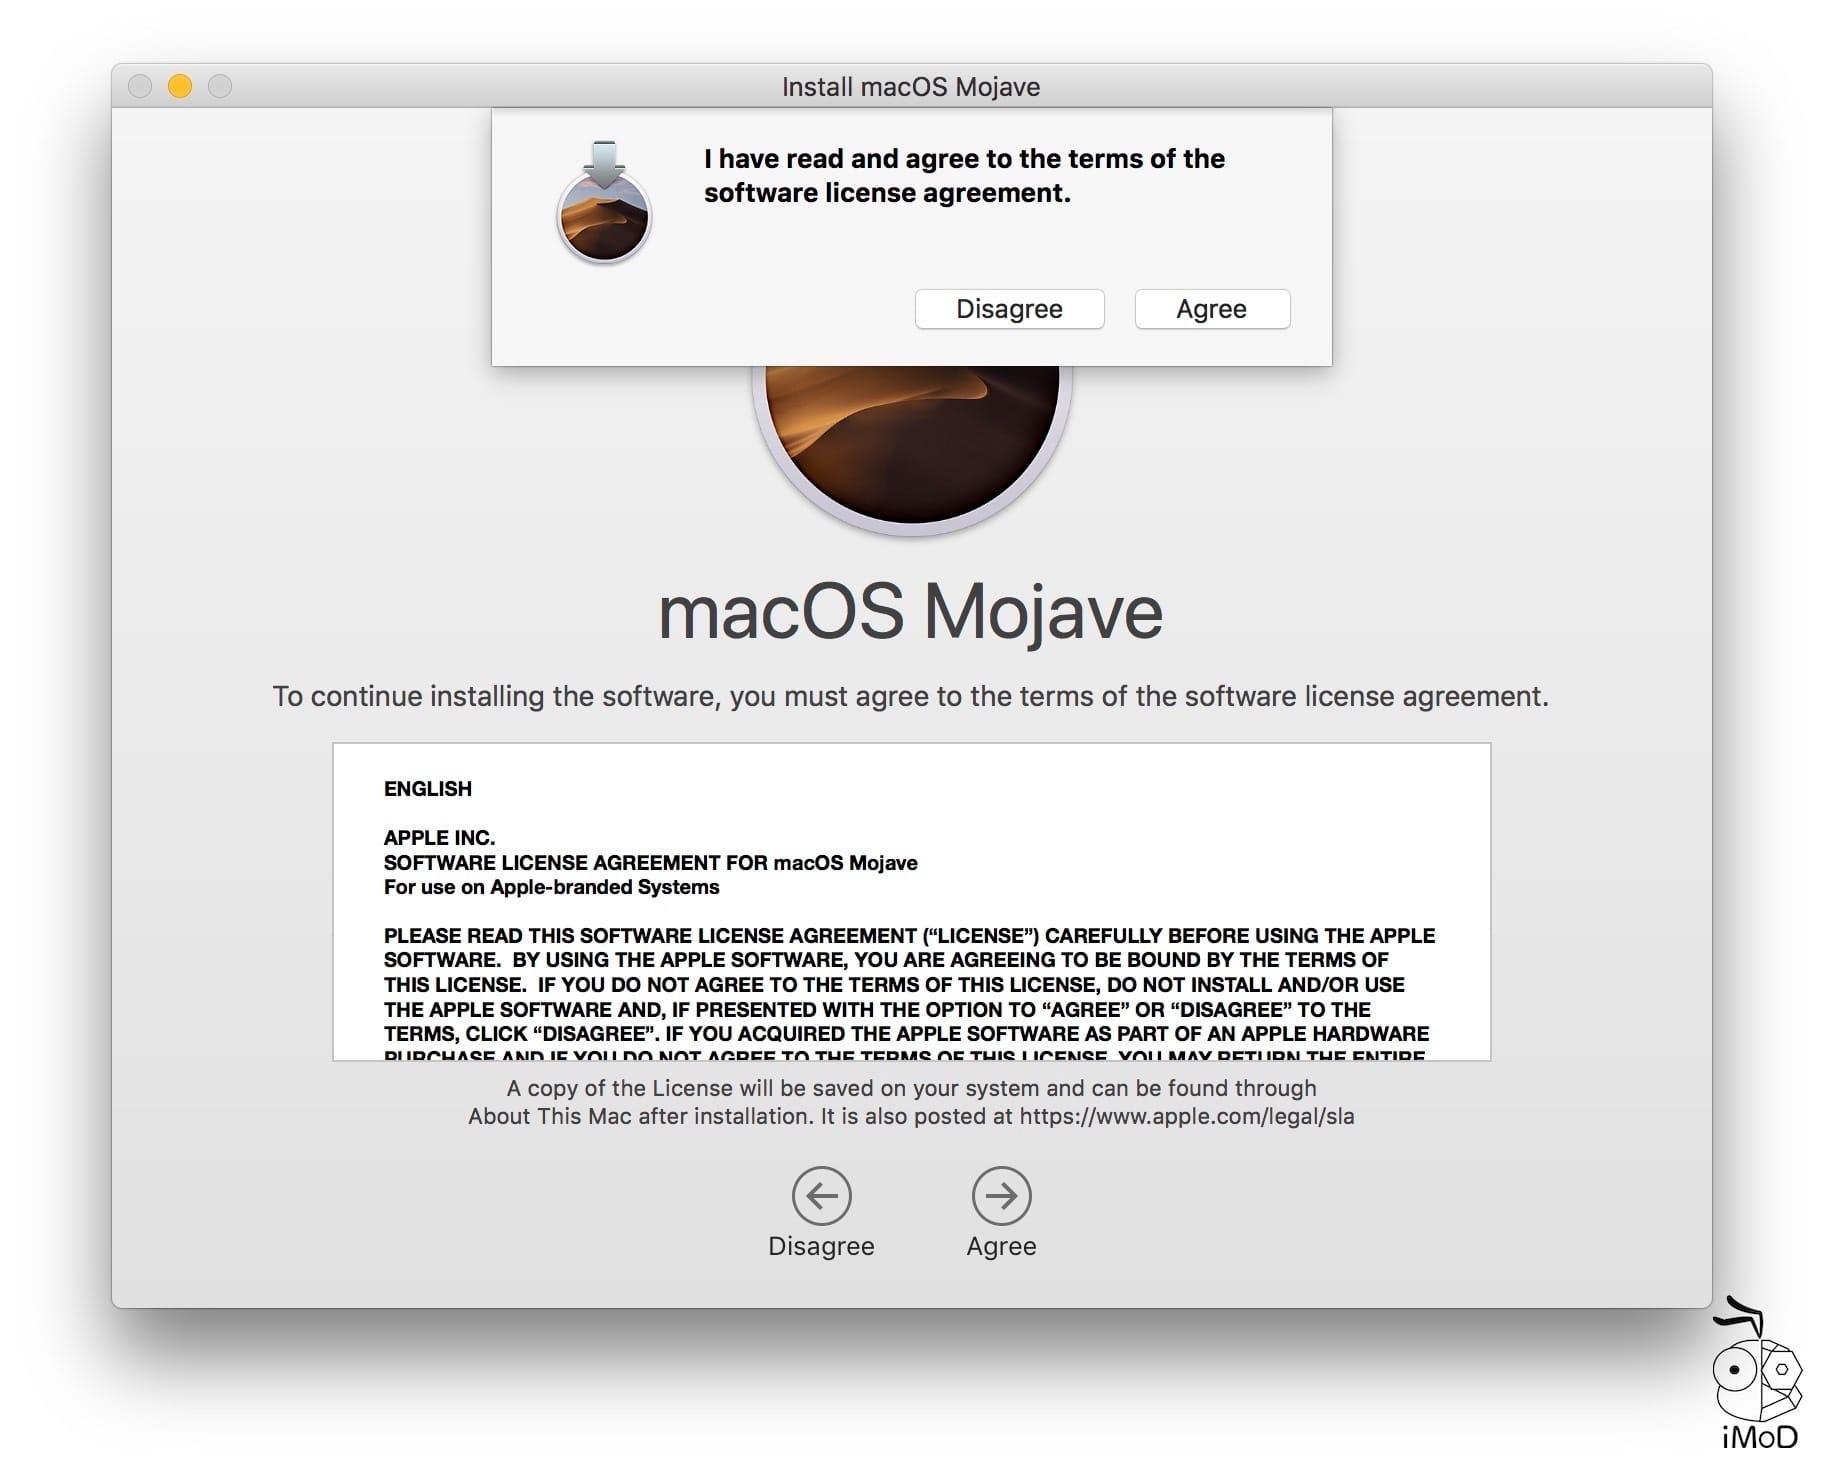 Install Macos Mojave Screenshot 2018 10 01 09.58.54